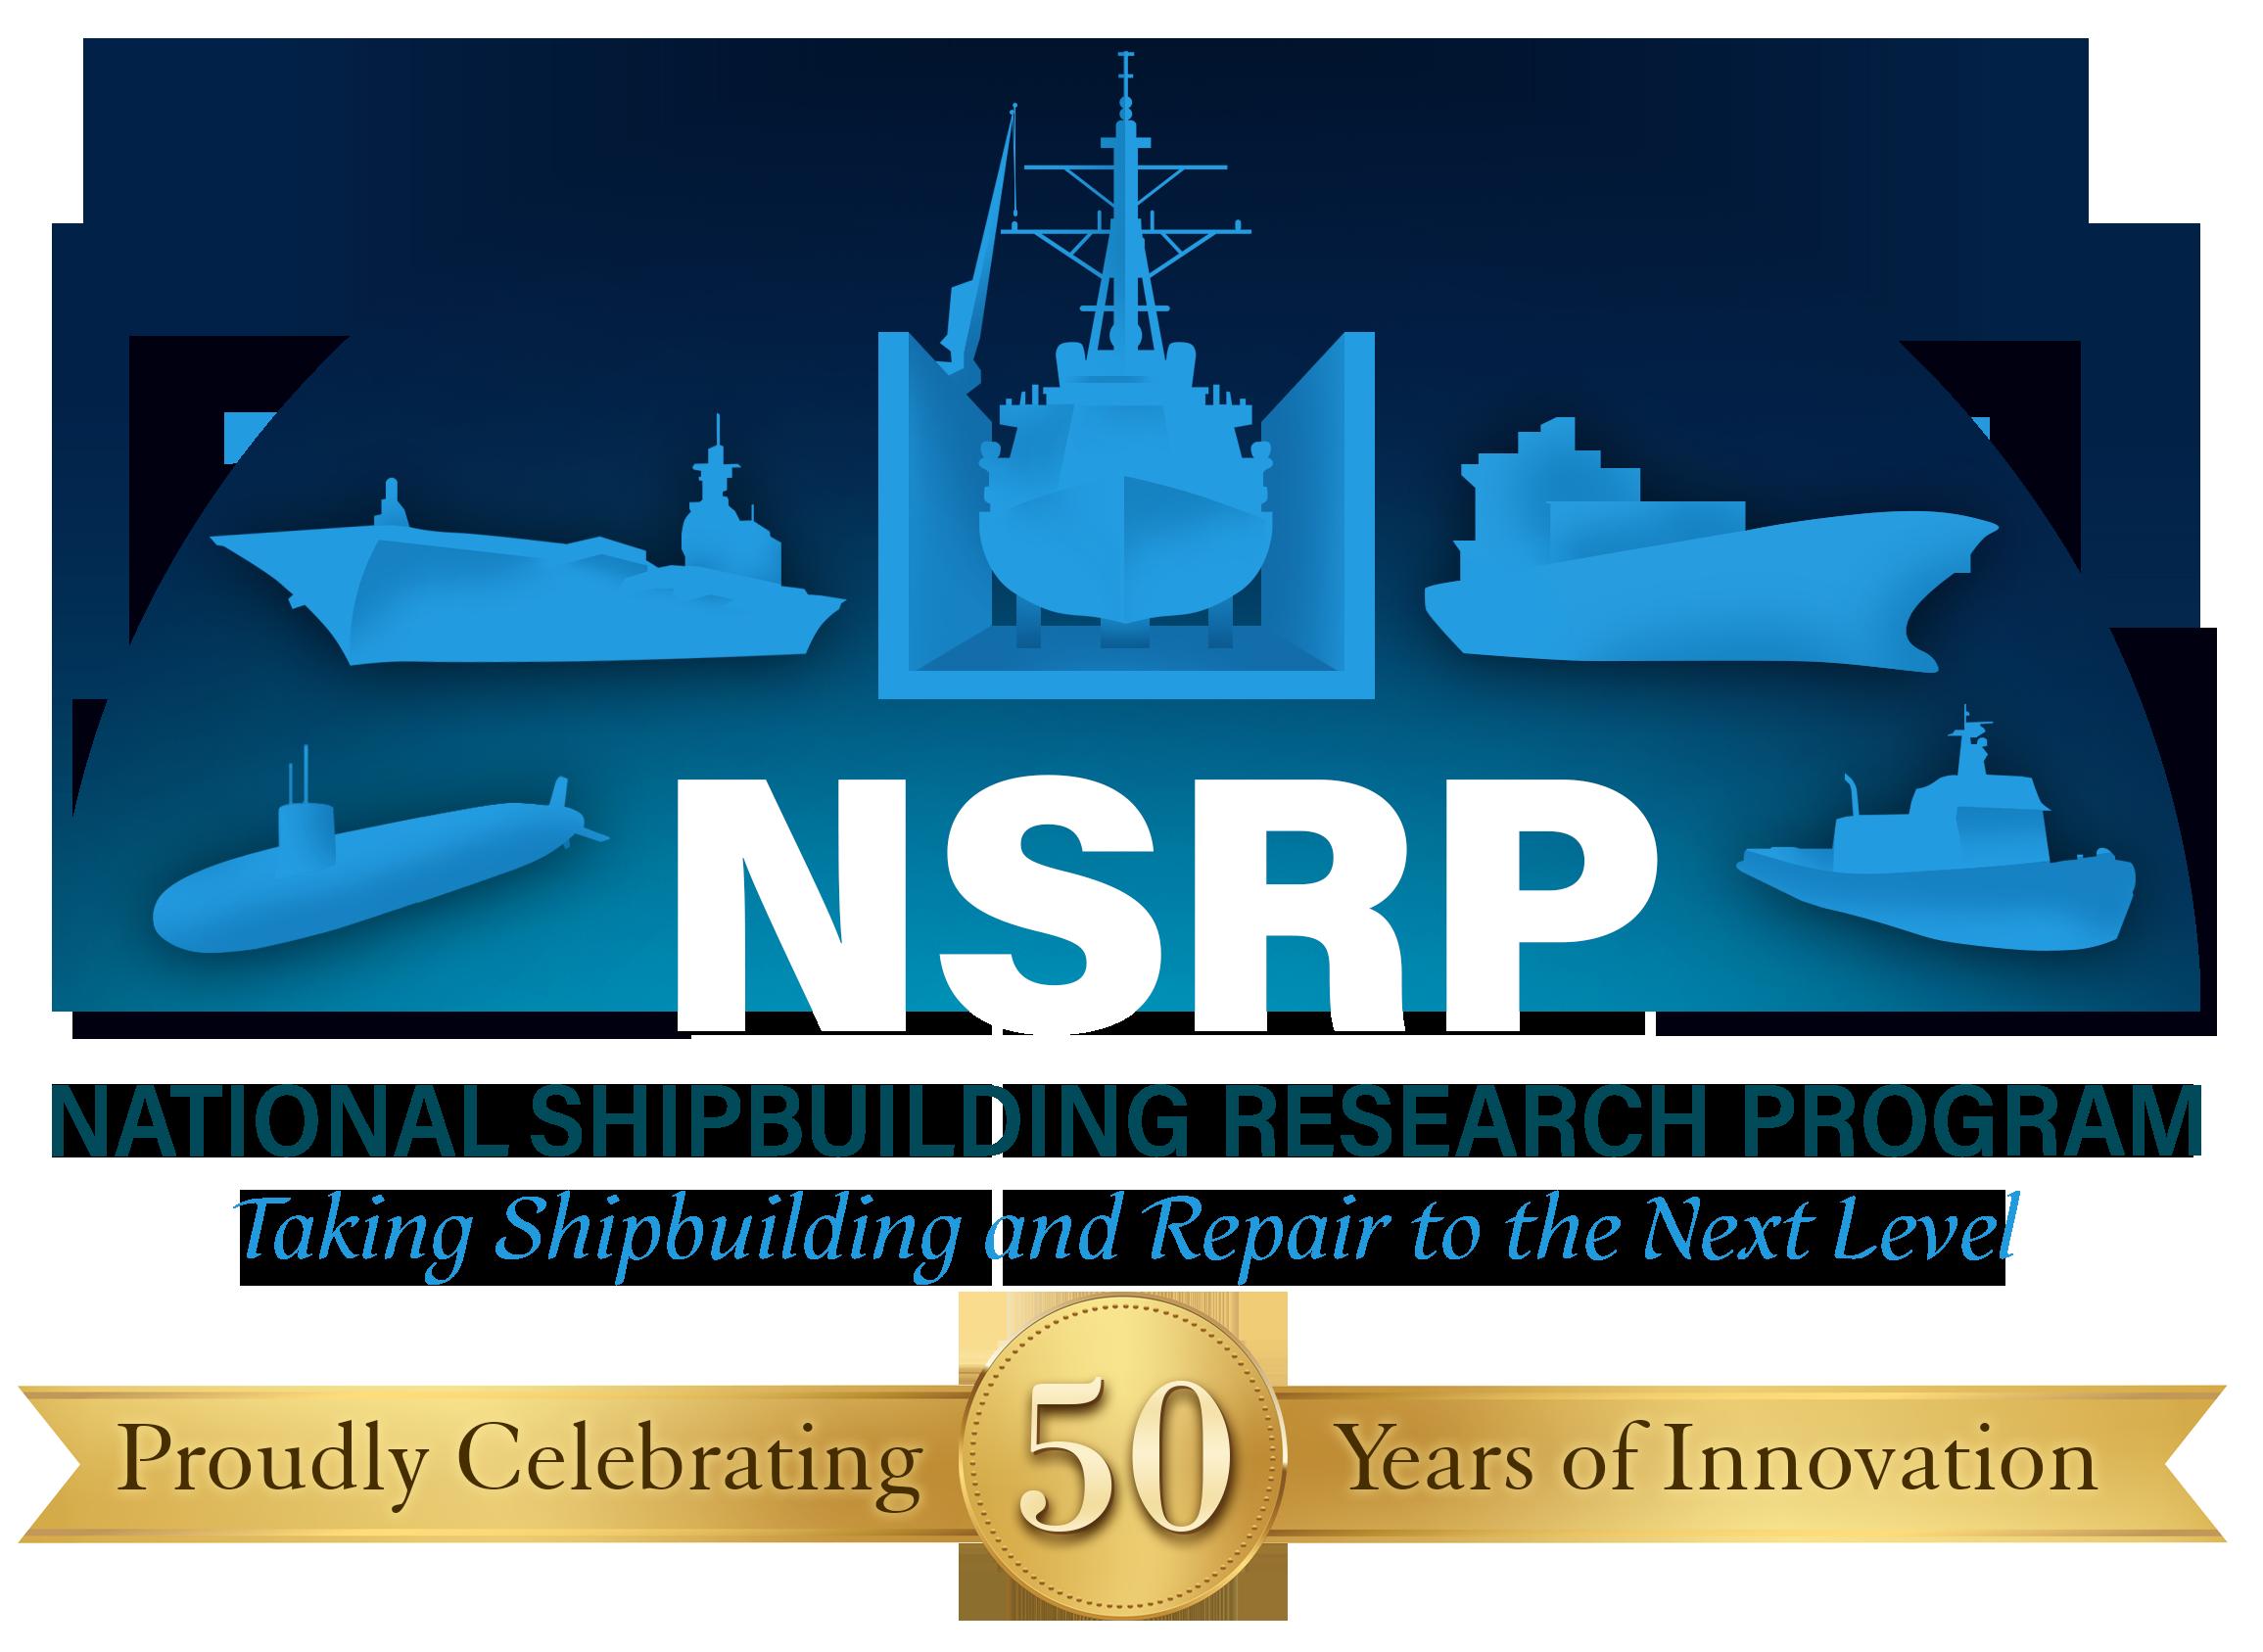 National Shipbuilding Research Program (NSRP) logo